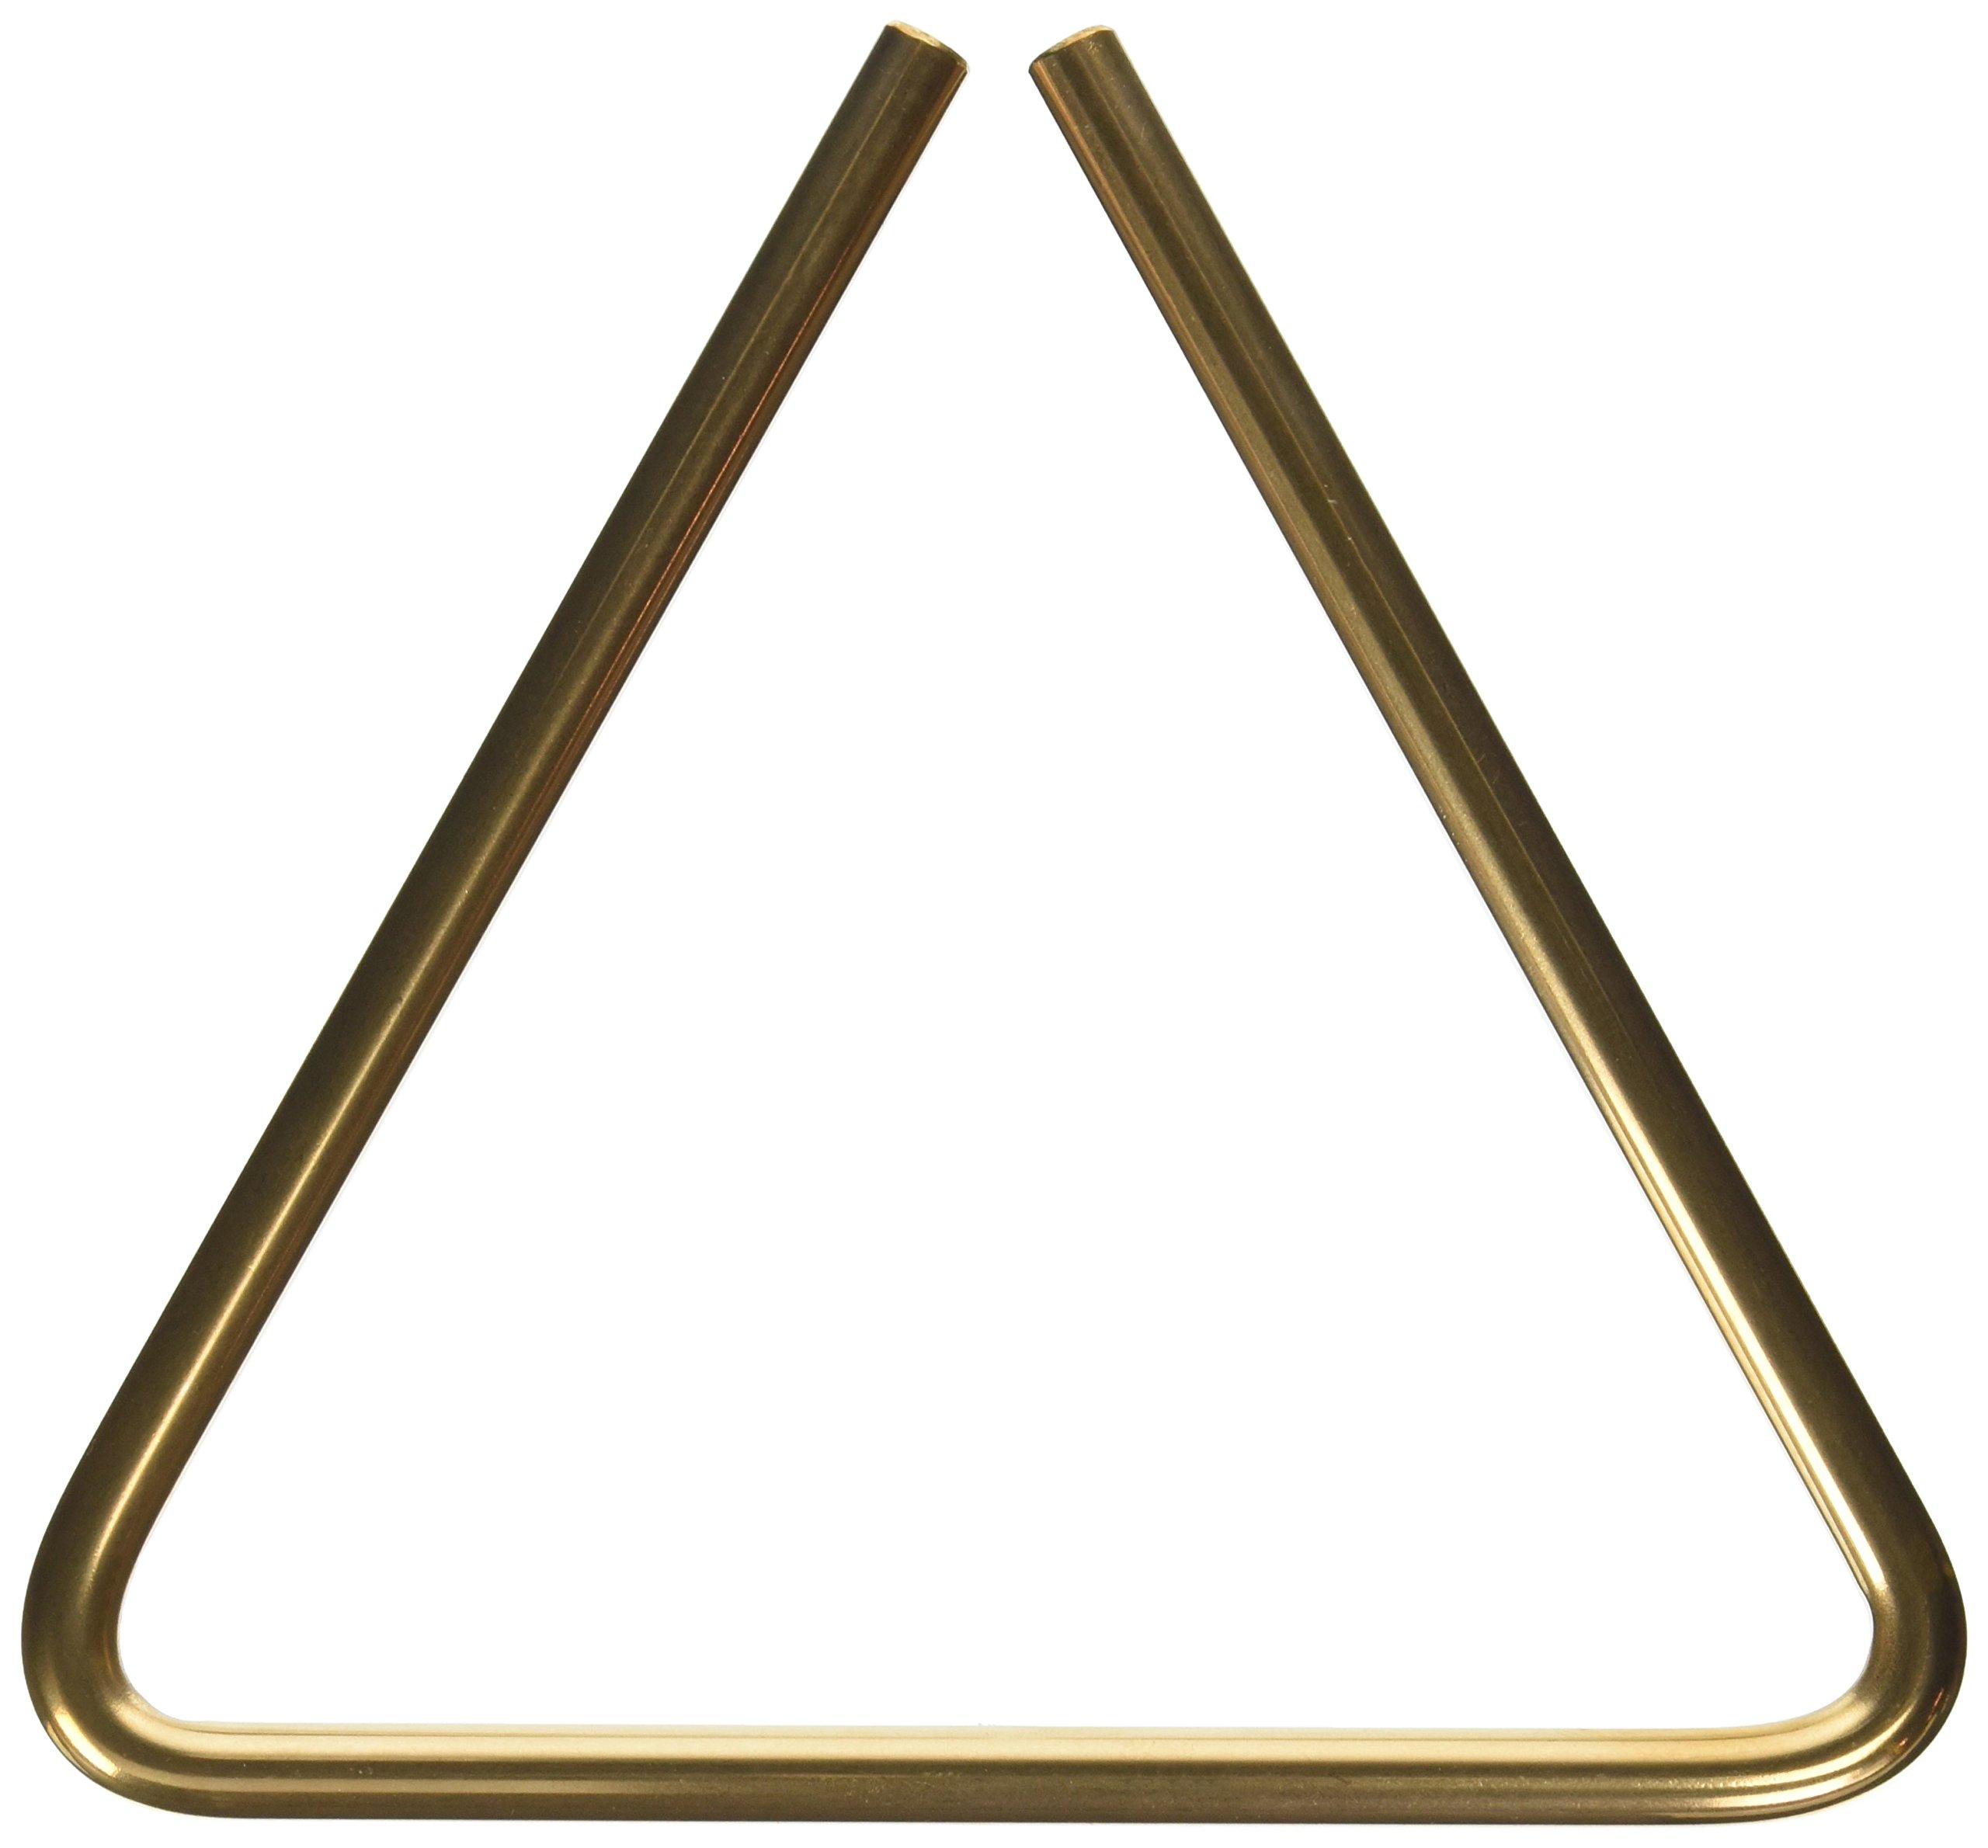 Sabian B8 Bronze Triangle, 7-inch